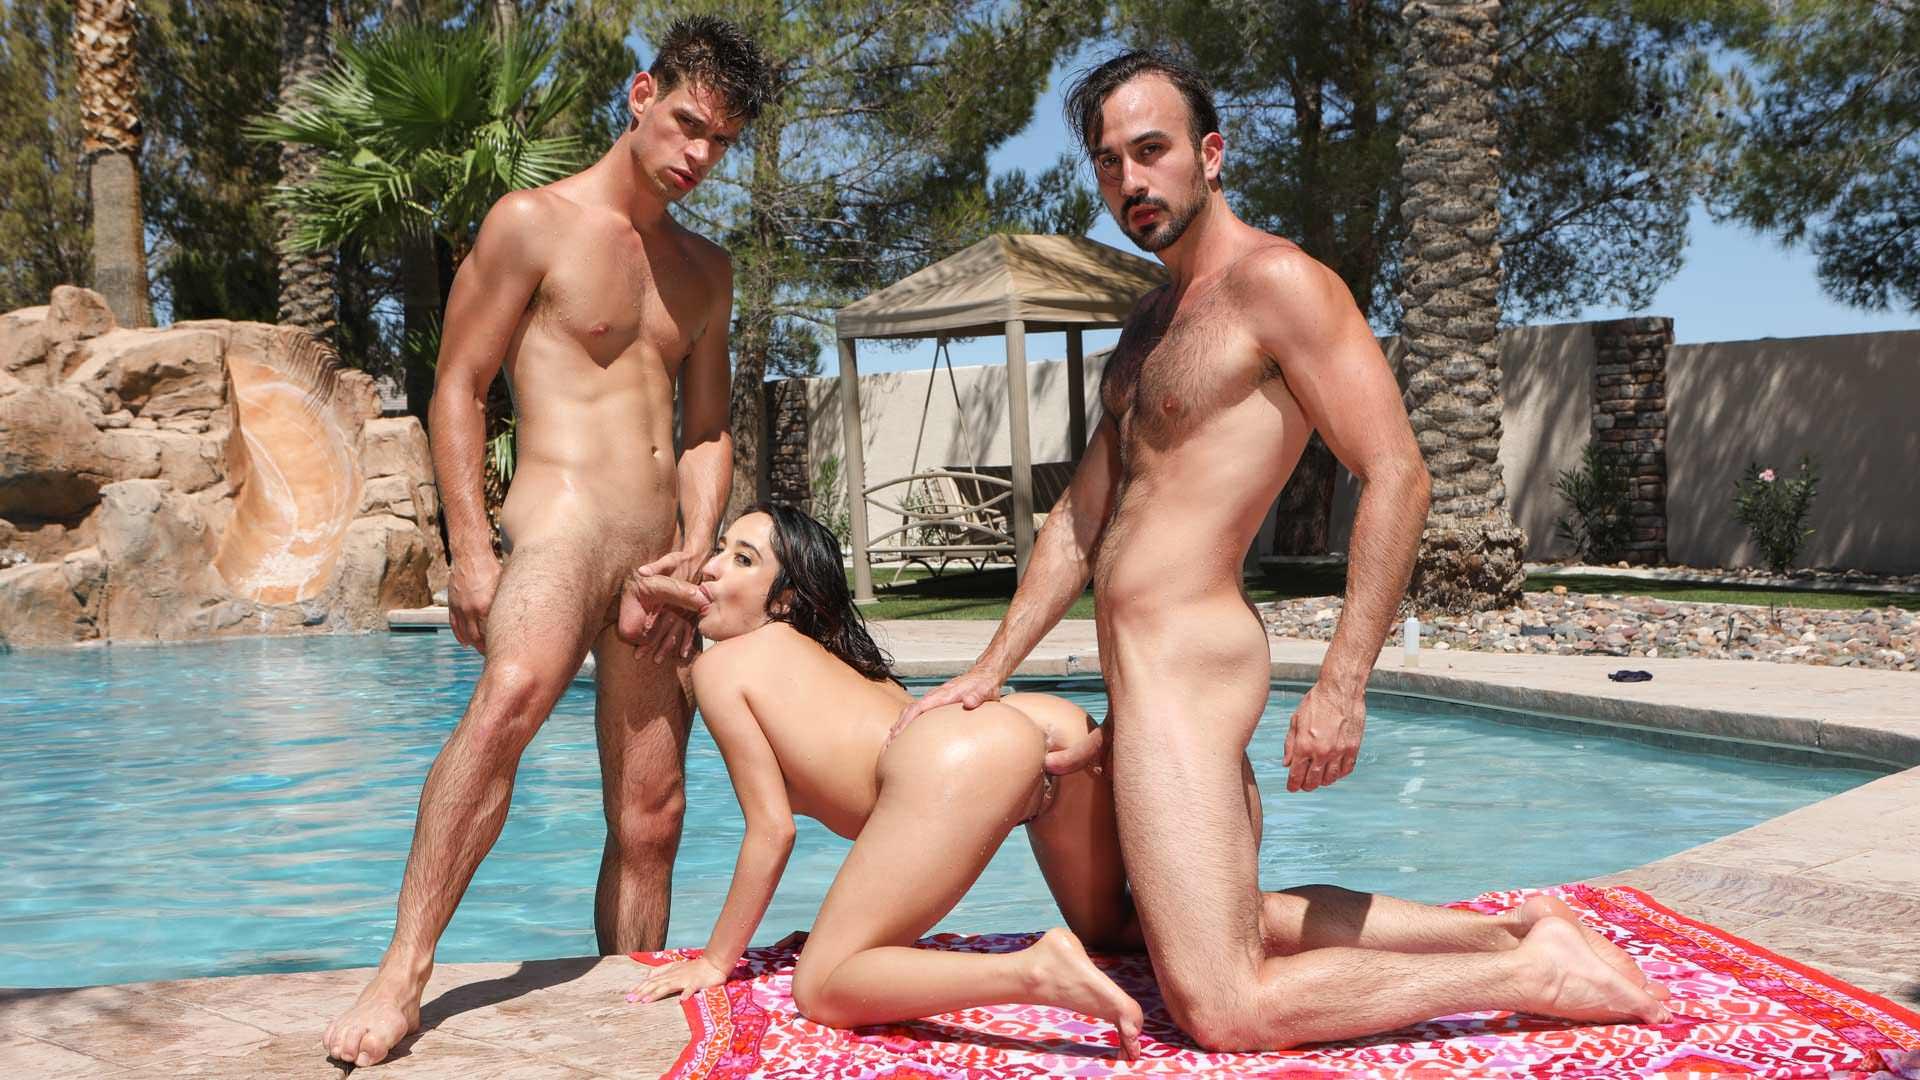 Bi More Oil - Michael DelRay & Mason Lear & Isabella Nice 1